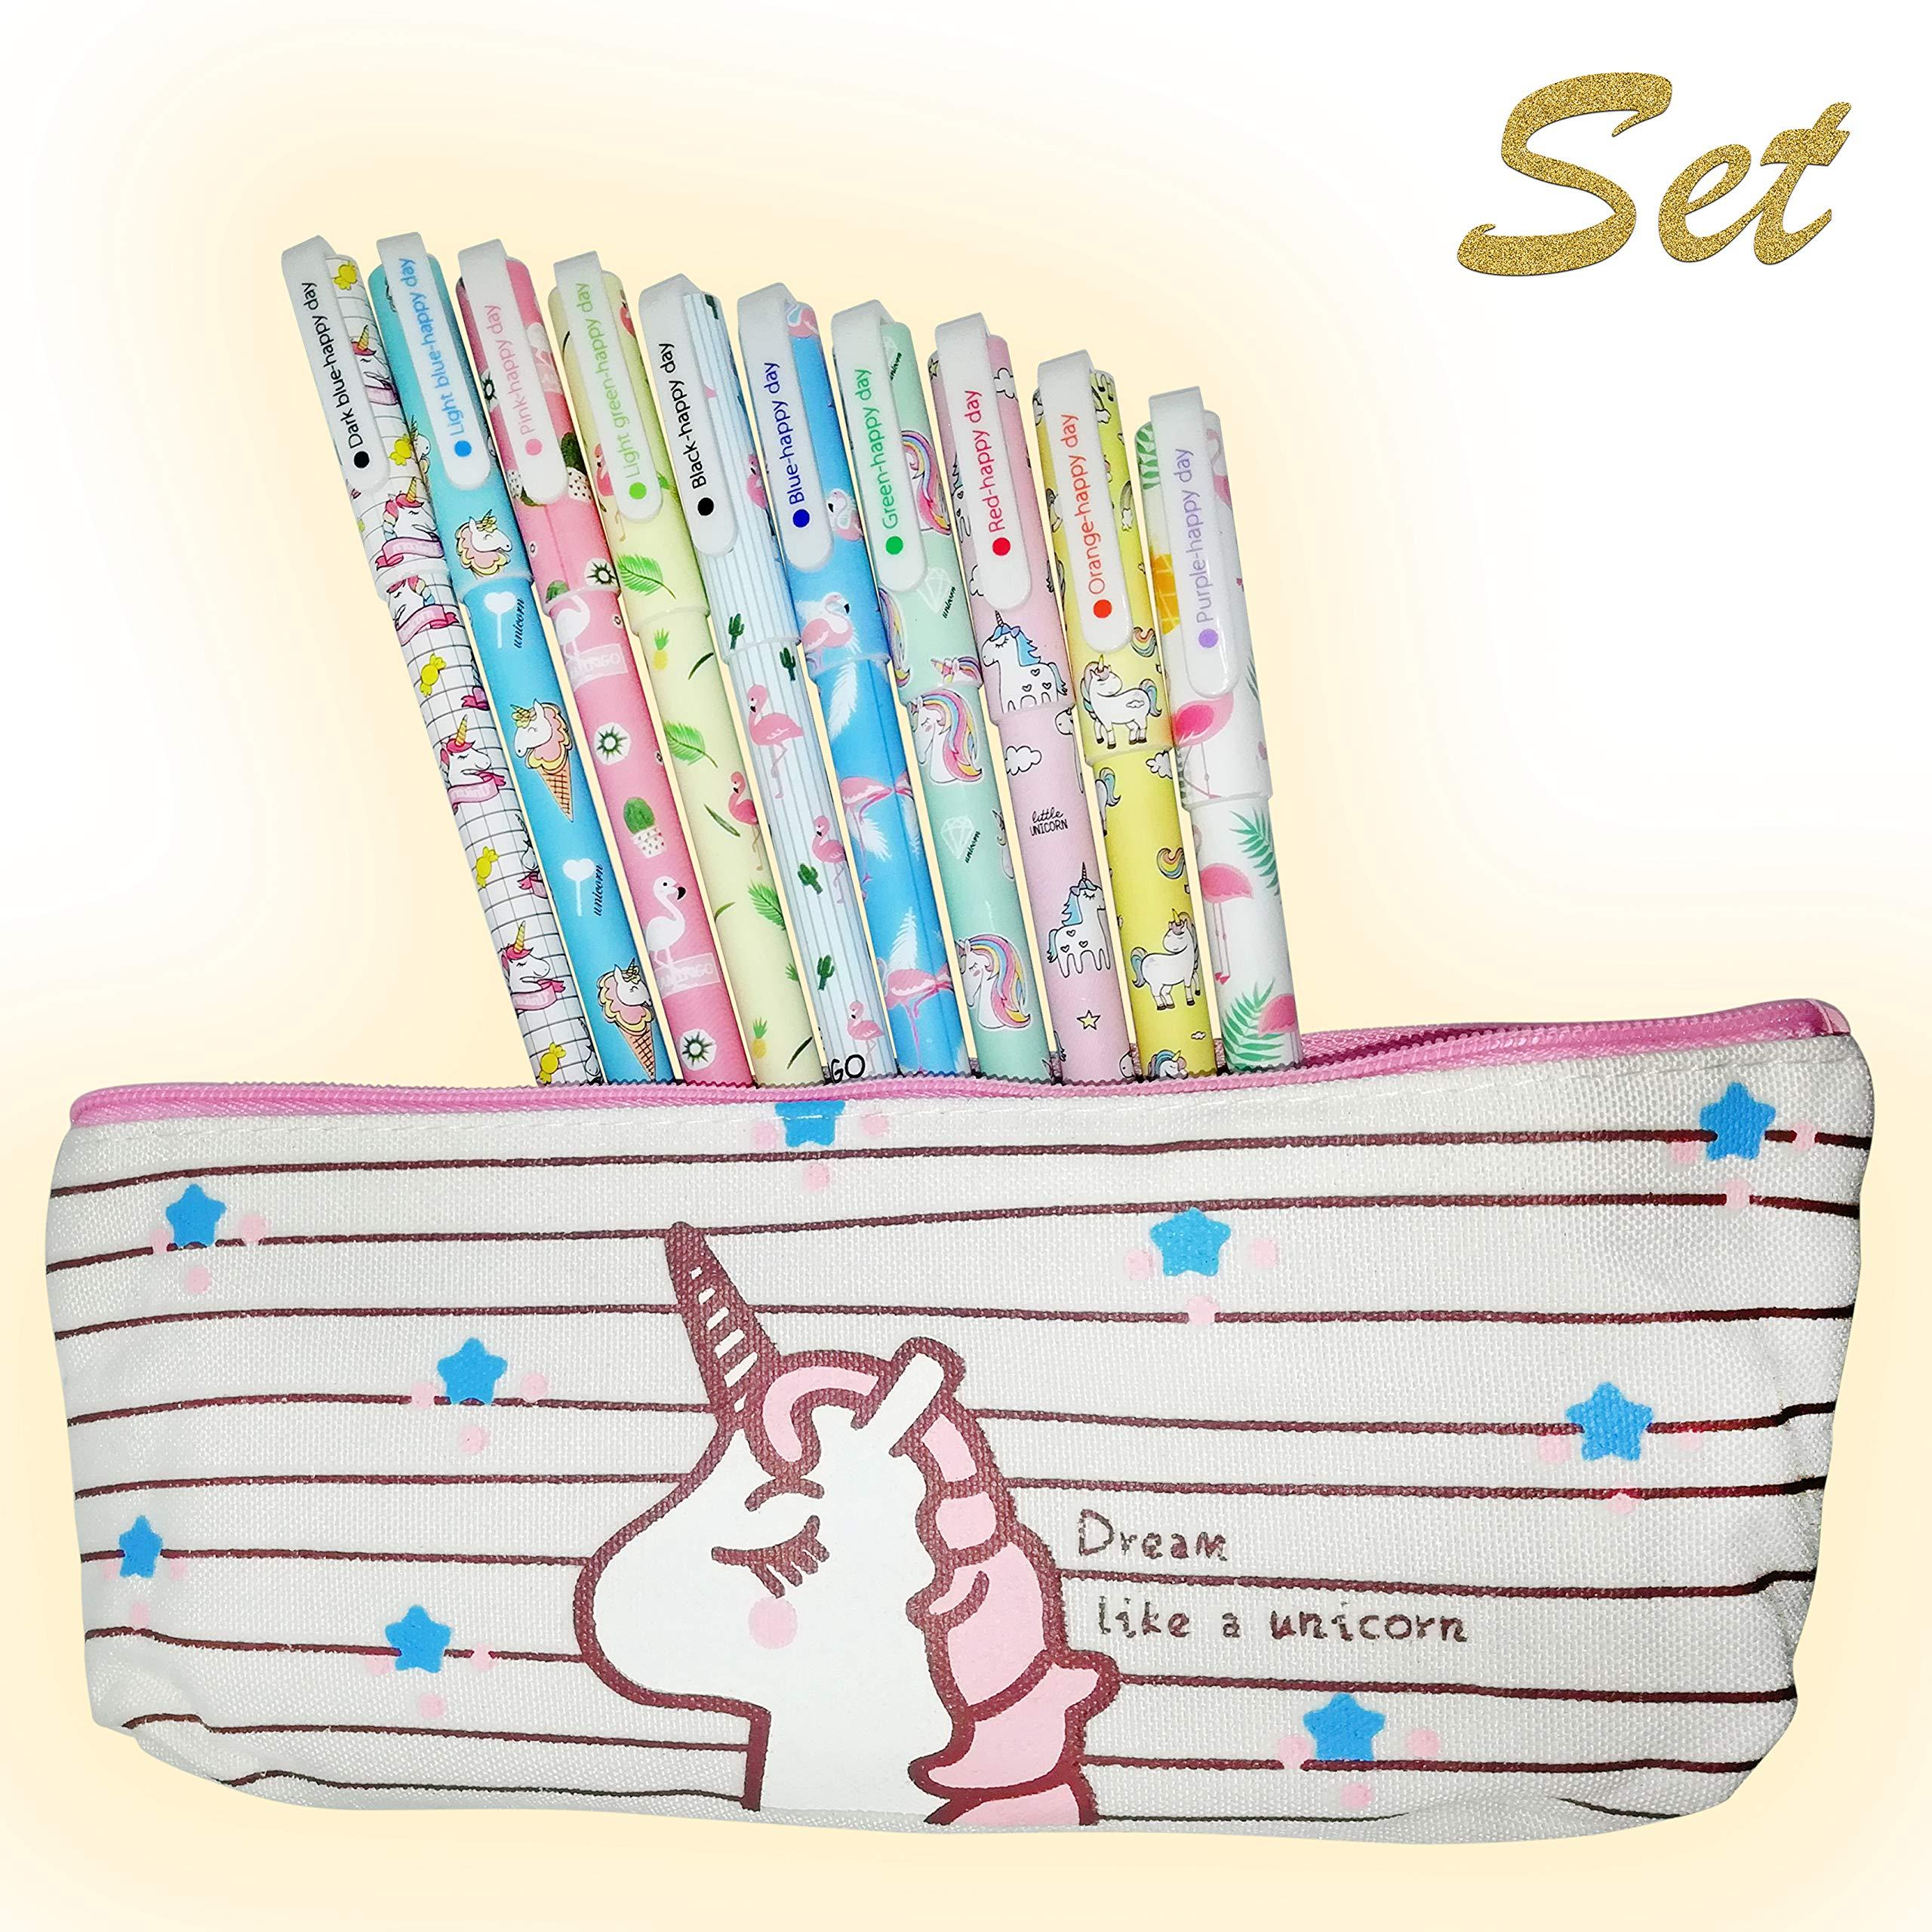 Set 10 pcs Unicorn Flamingo Gel Ink Pens + Plus Cute Unicorn Pencil case, fine point 0.5mm pen – Unicorn gifts for girls, Unicorn Favors Party Supplies for girls – By Cutieyou